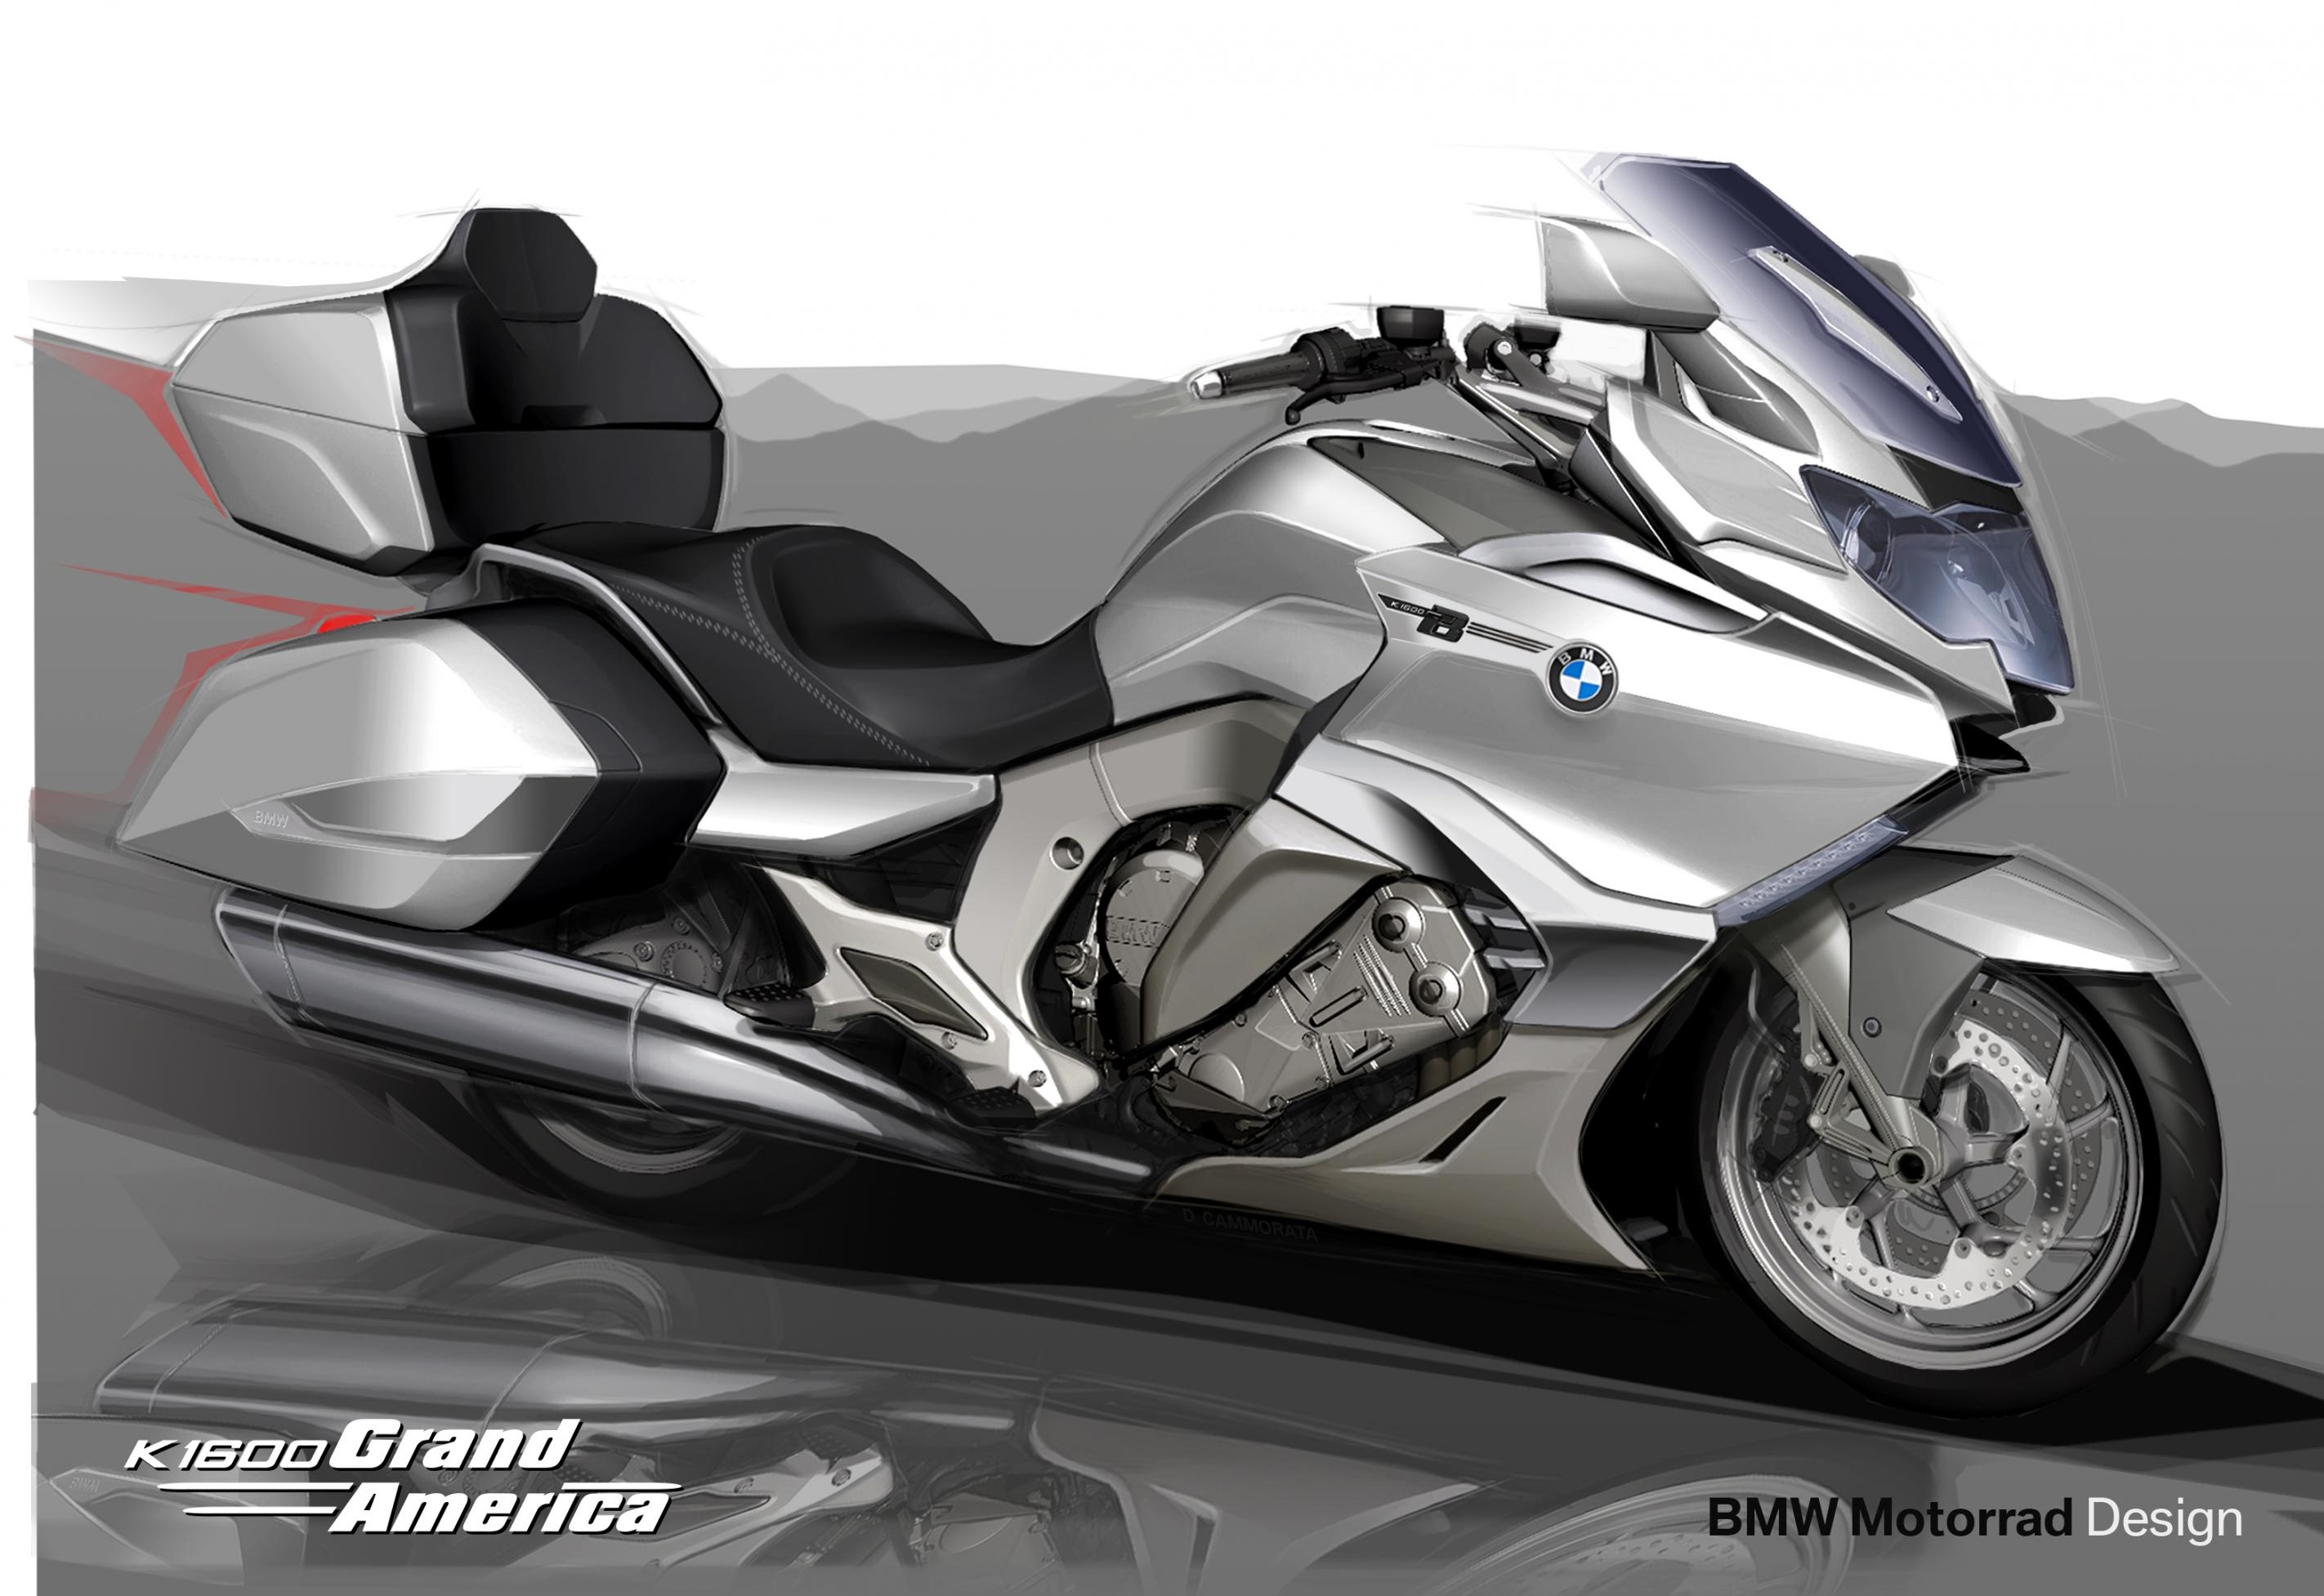 For Sale Bmw K1600 Grand America The Bike Market